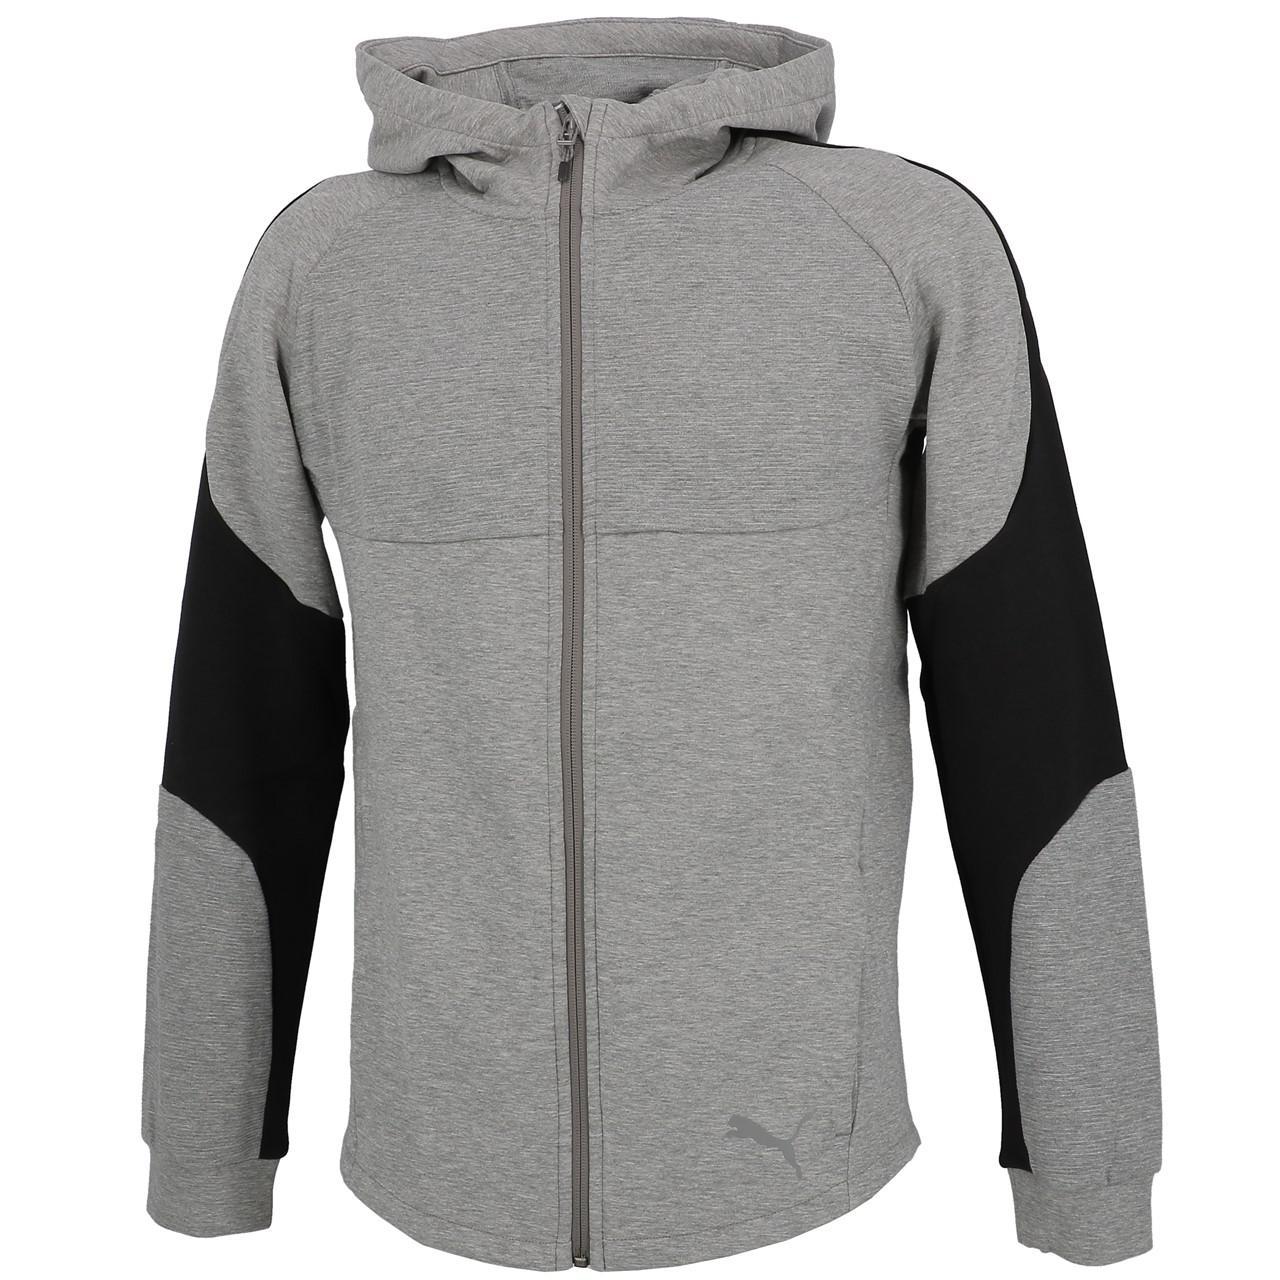 Jacken-Sweatshirts-Zipped-Kapuze-Puma-Evostripe-Anc-Fzcap-Sw-Jr-Grau-25708-Neu